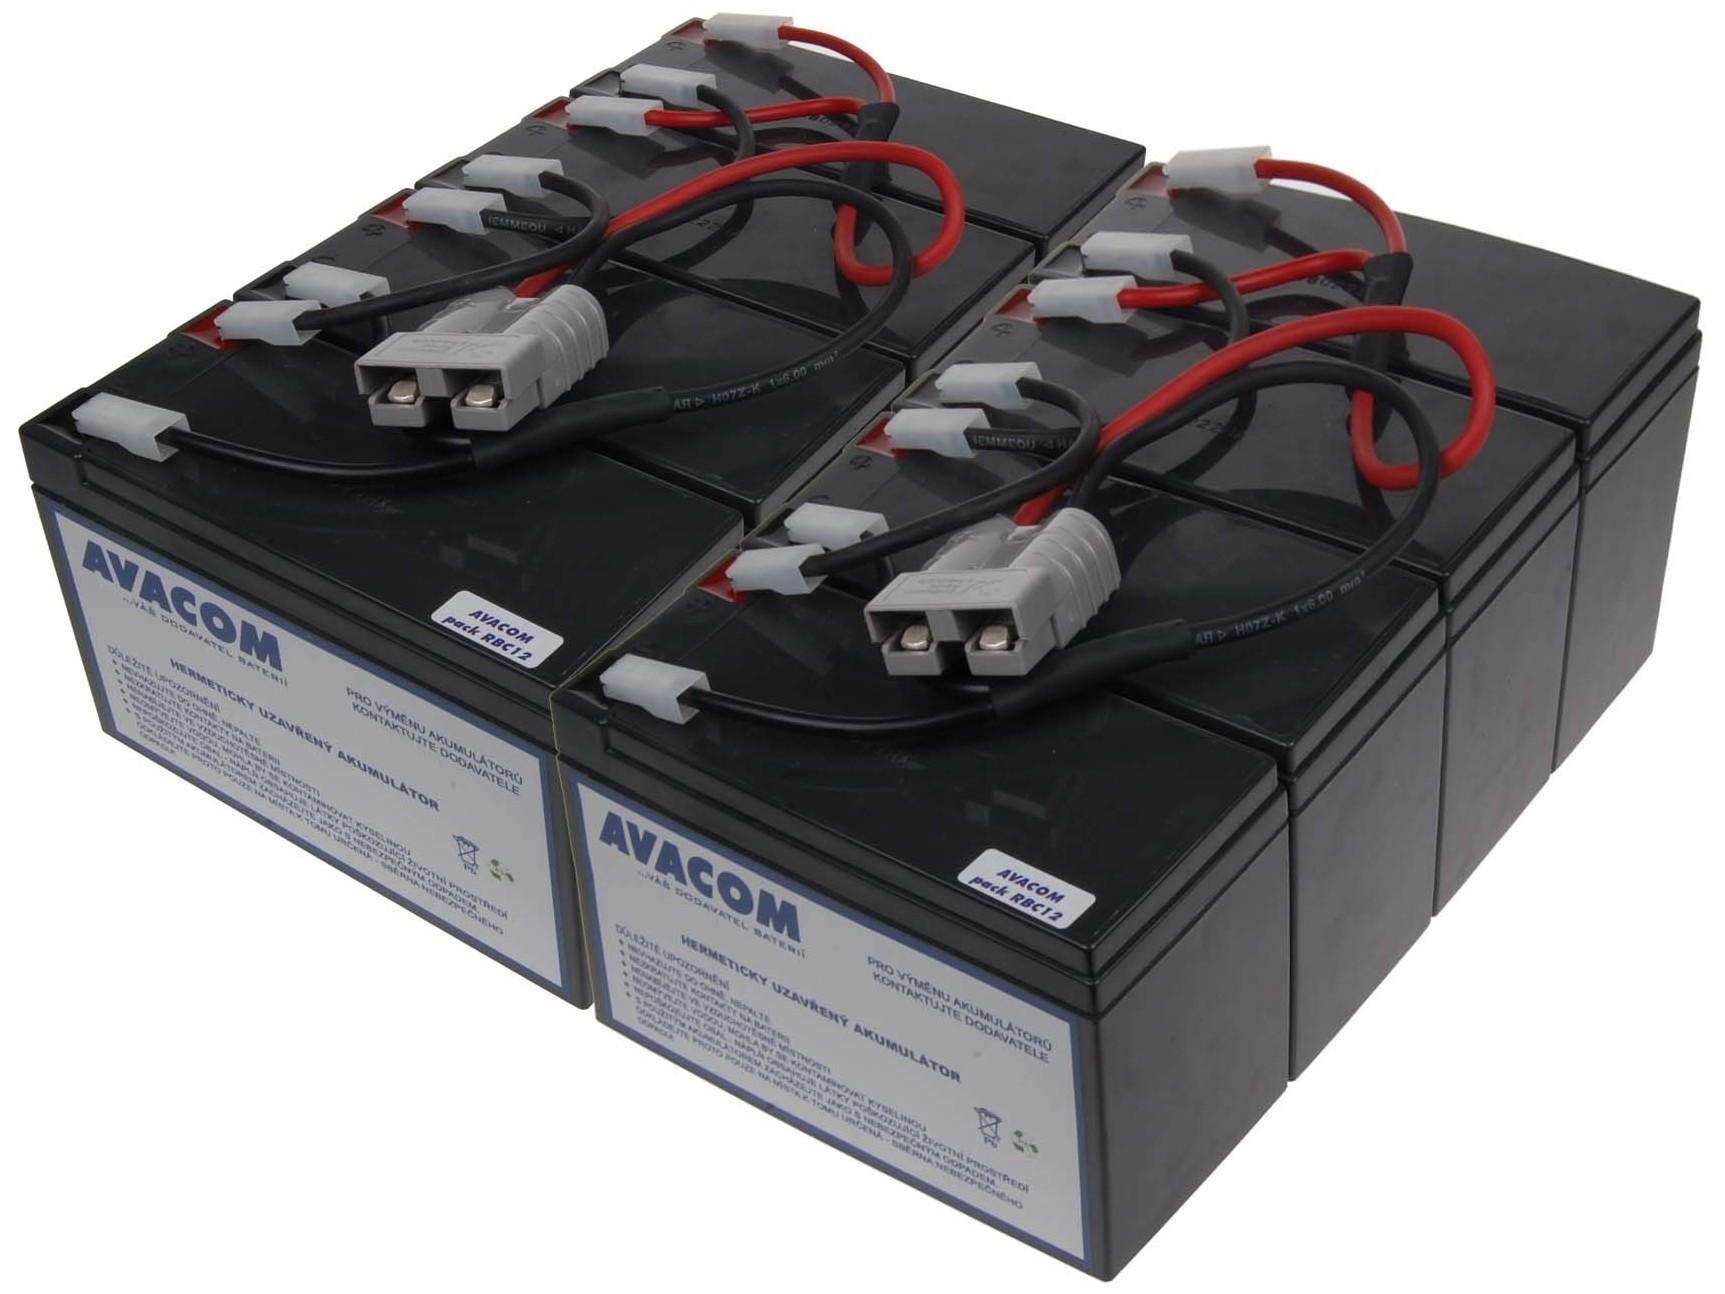 Baterie AVACOM AVA-RBC12 náhrada za RBC12 - baterie pro UPS